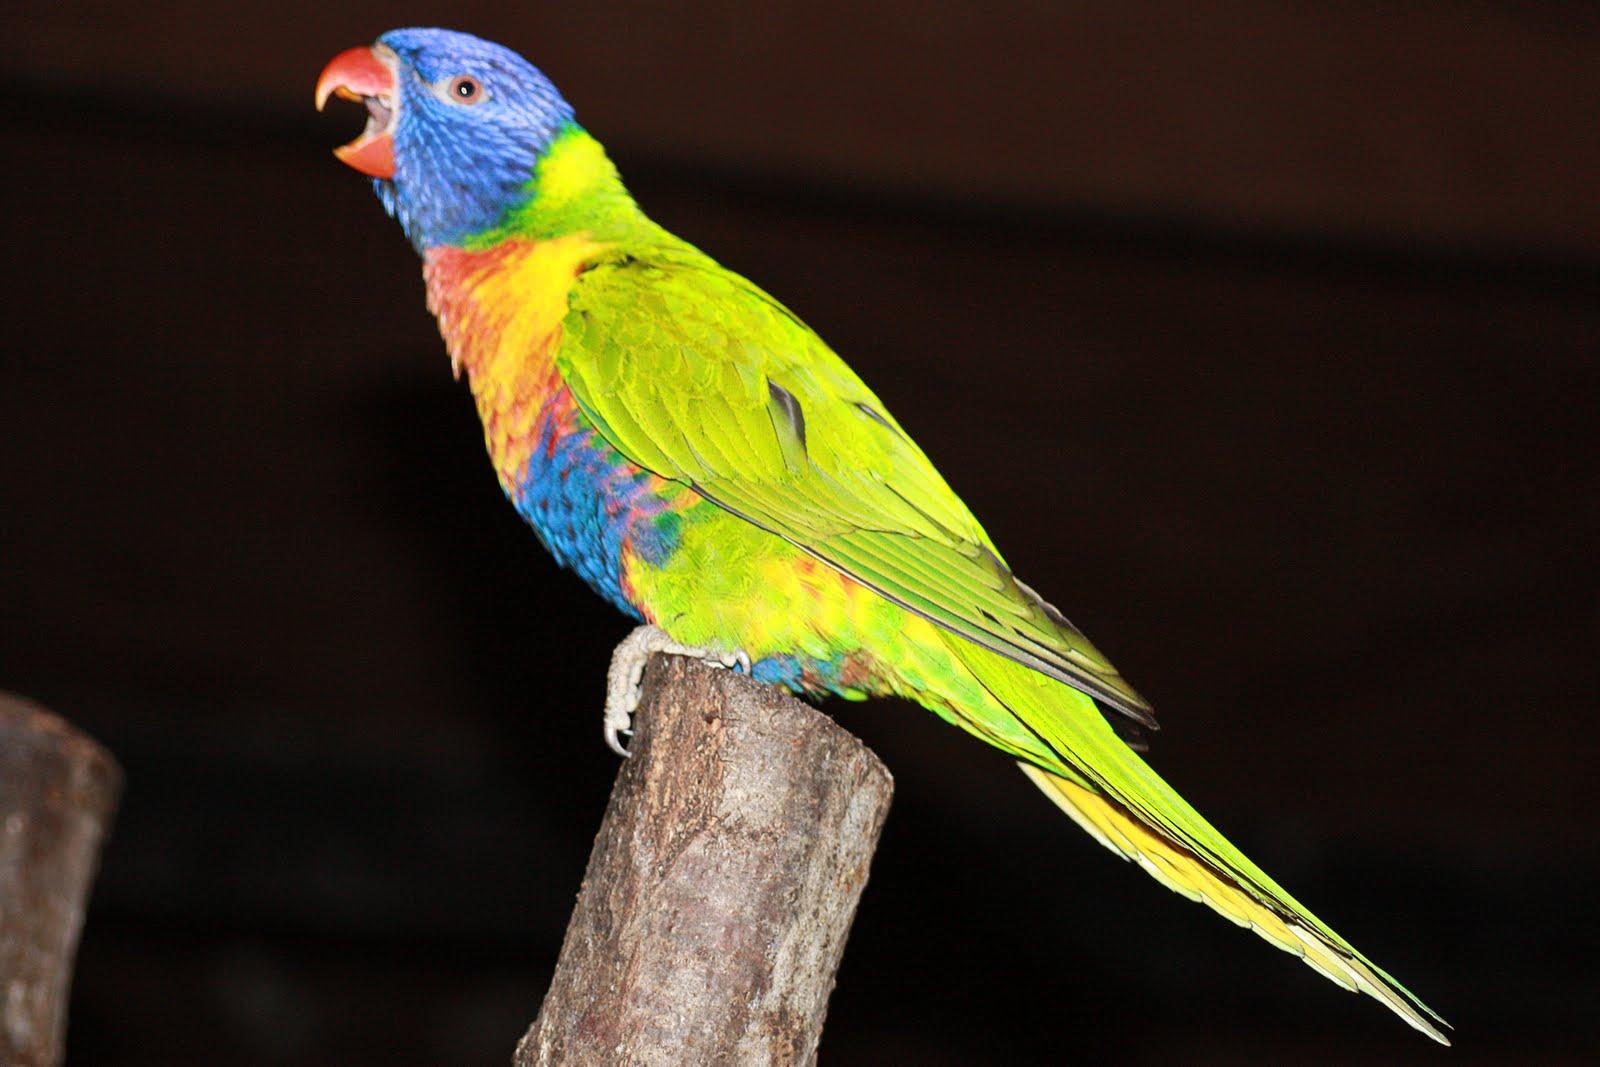 Trans Pond: colorful birds